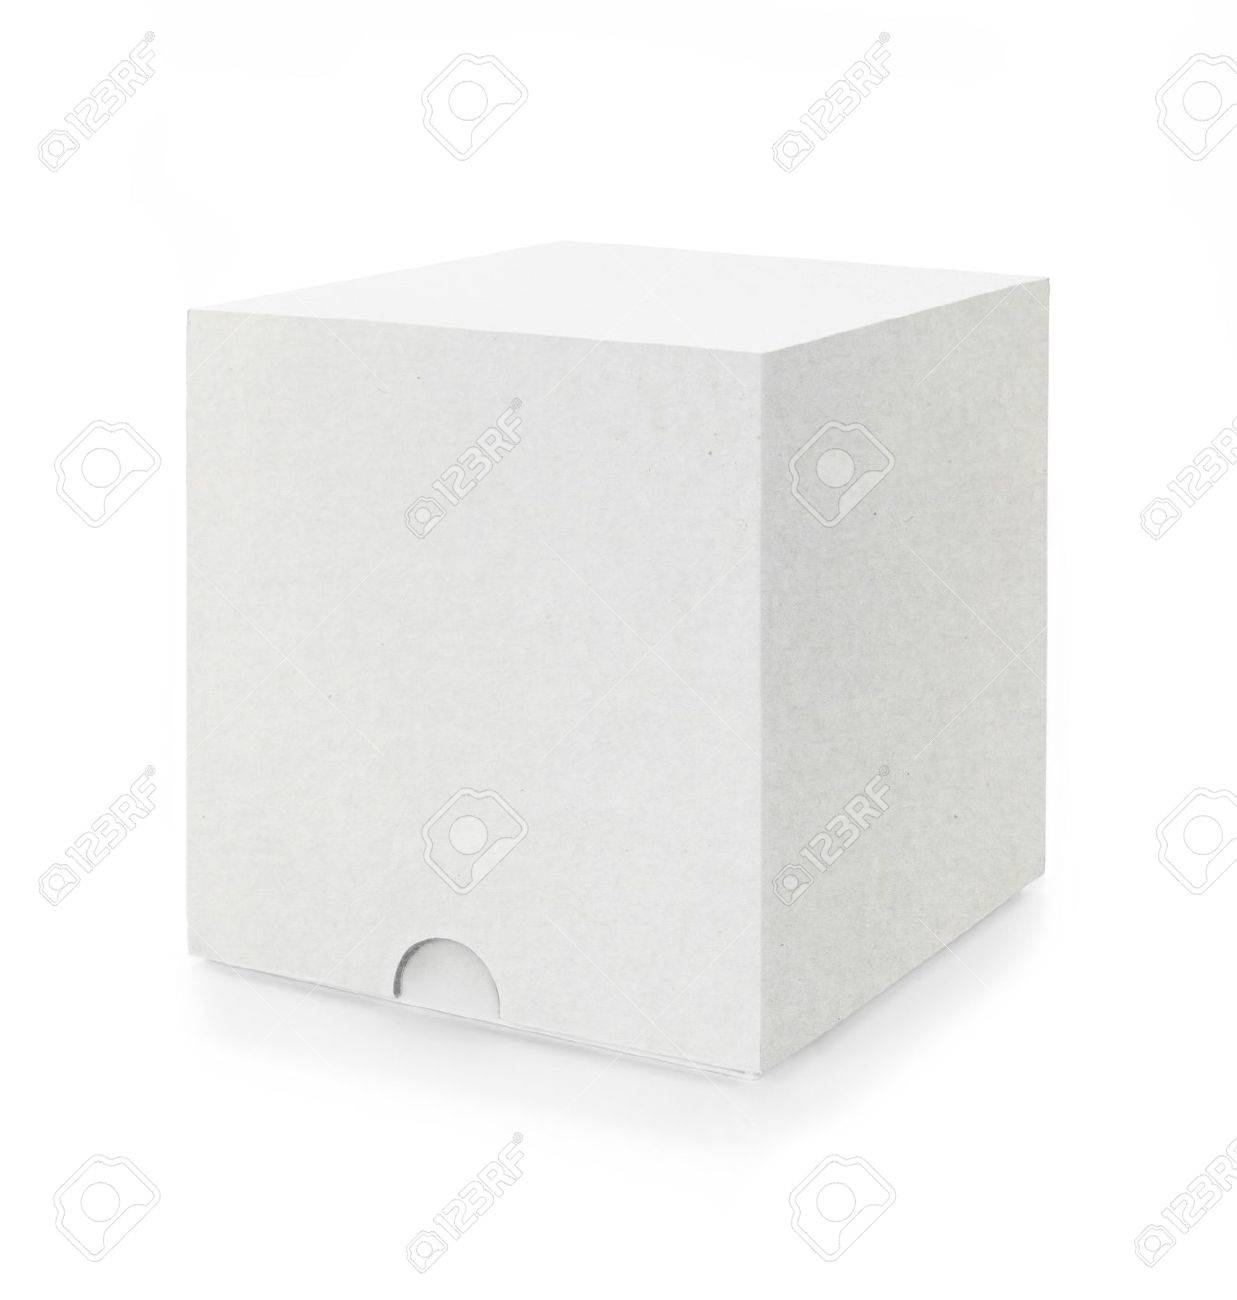 a white box isolated on white background Stock Photo - 10000147